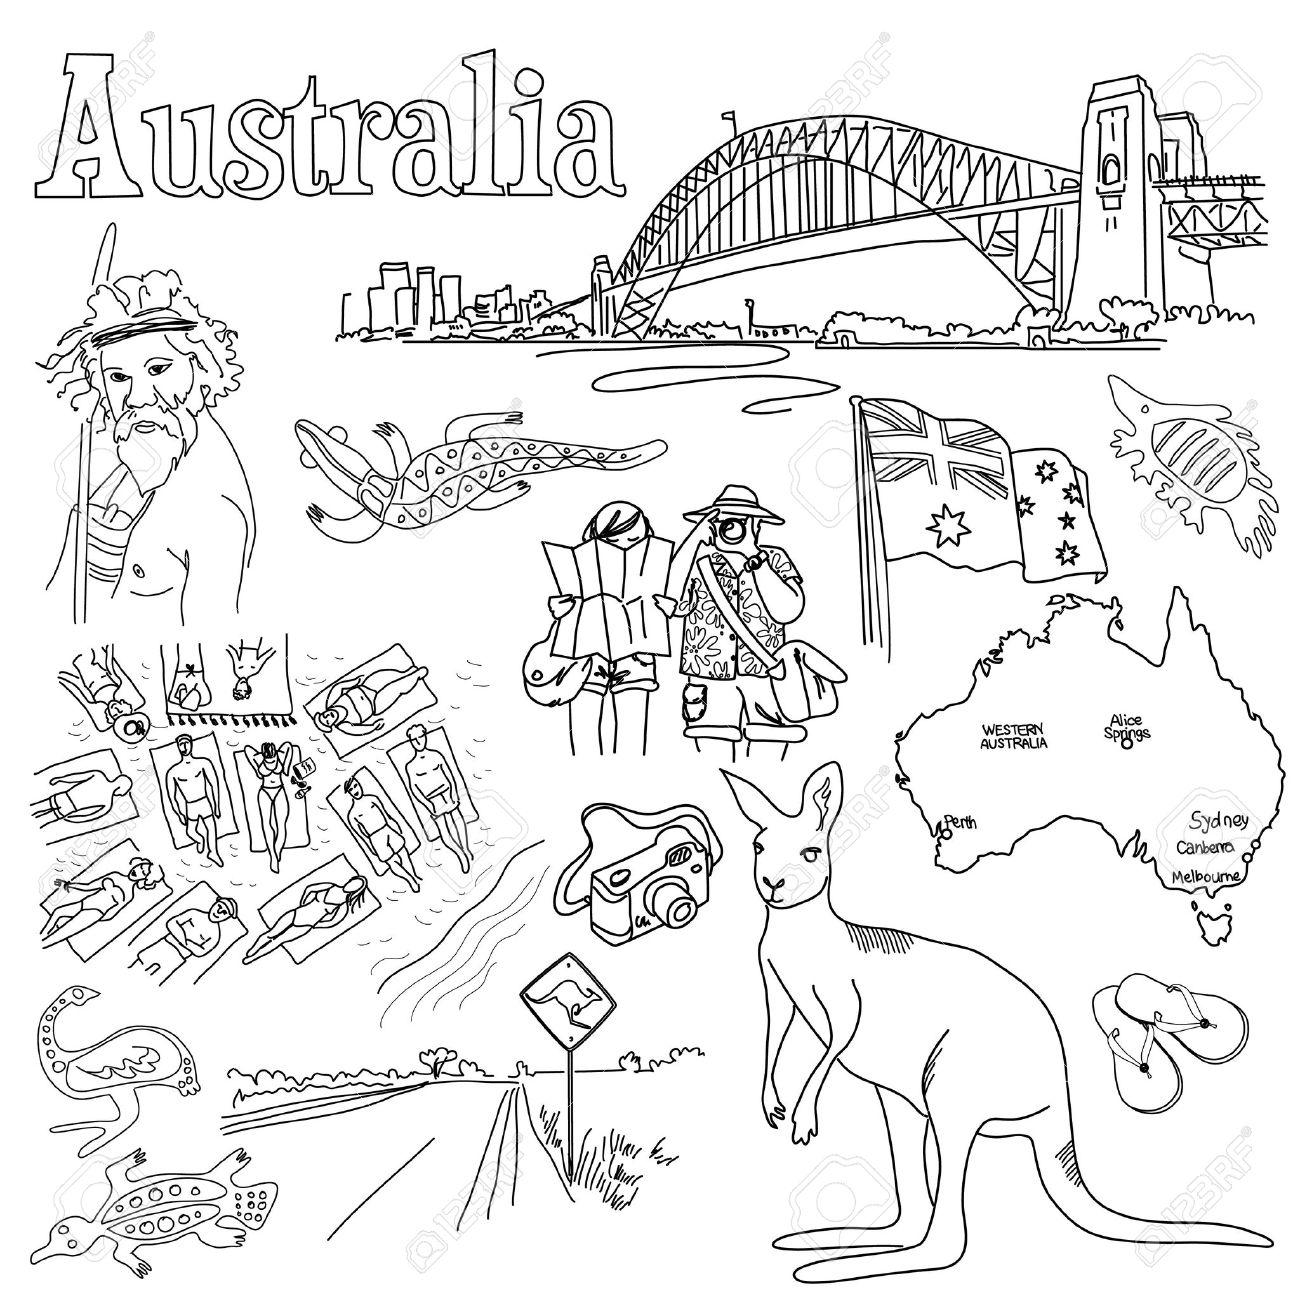 Australia clipart drawing. At getdrawings com free